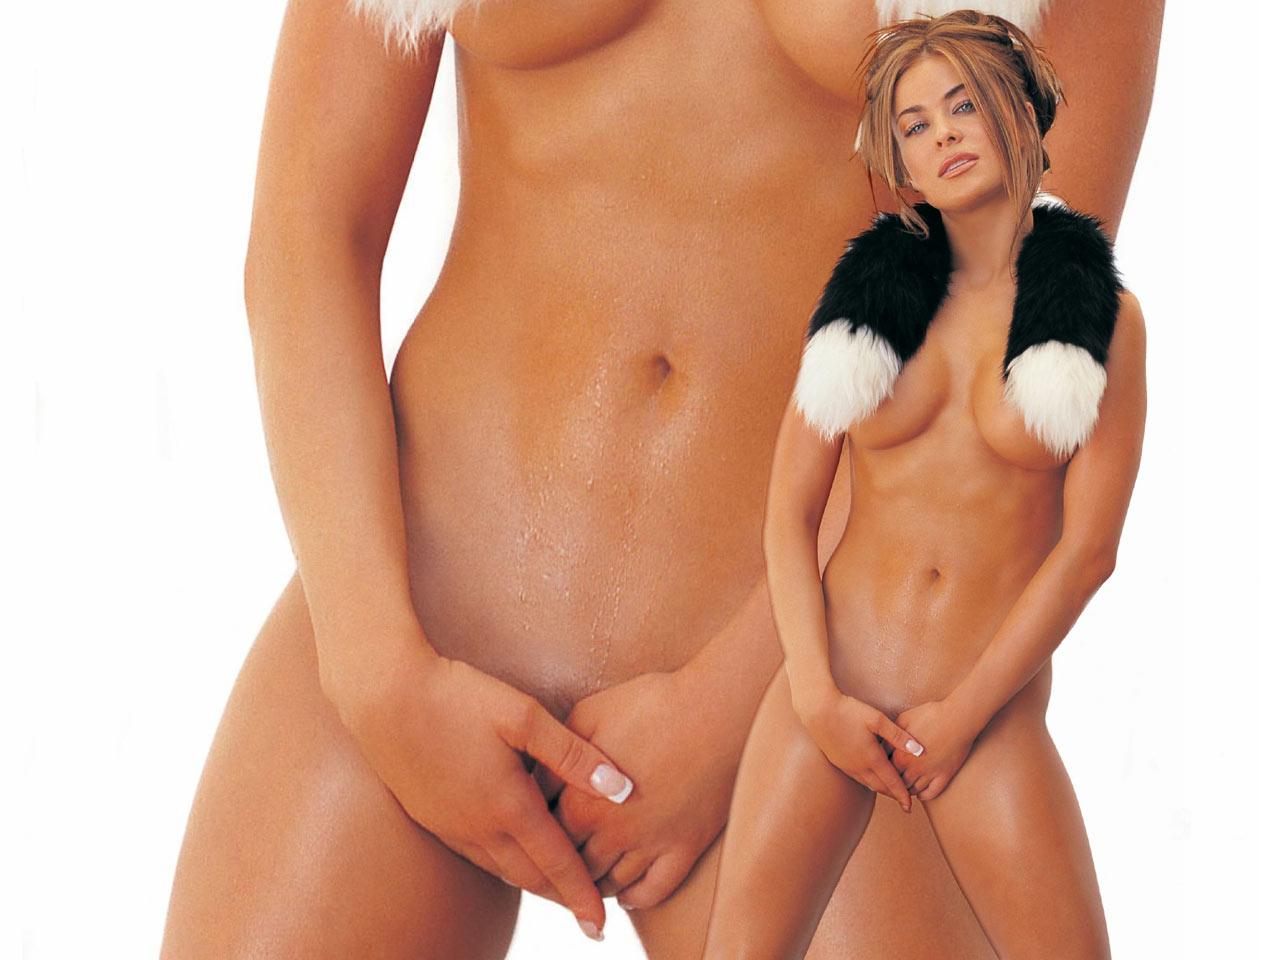 film erotico hot chatta chatta gratis